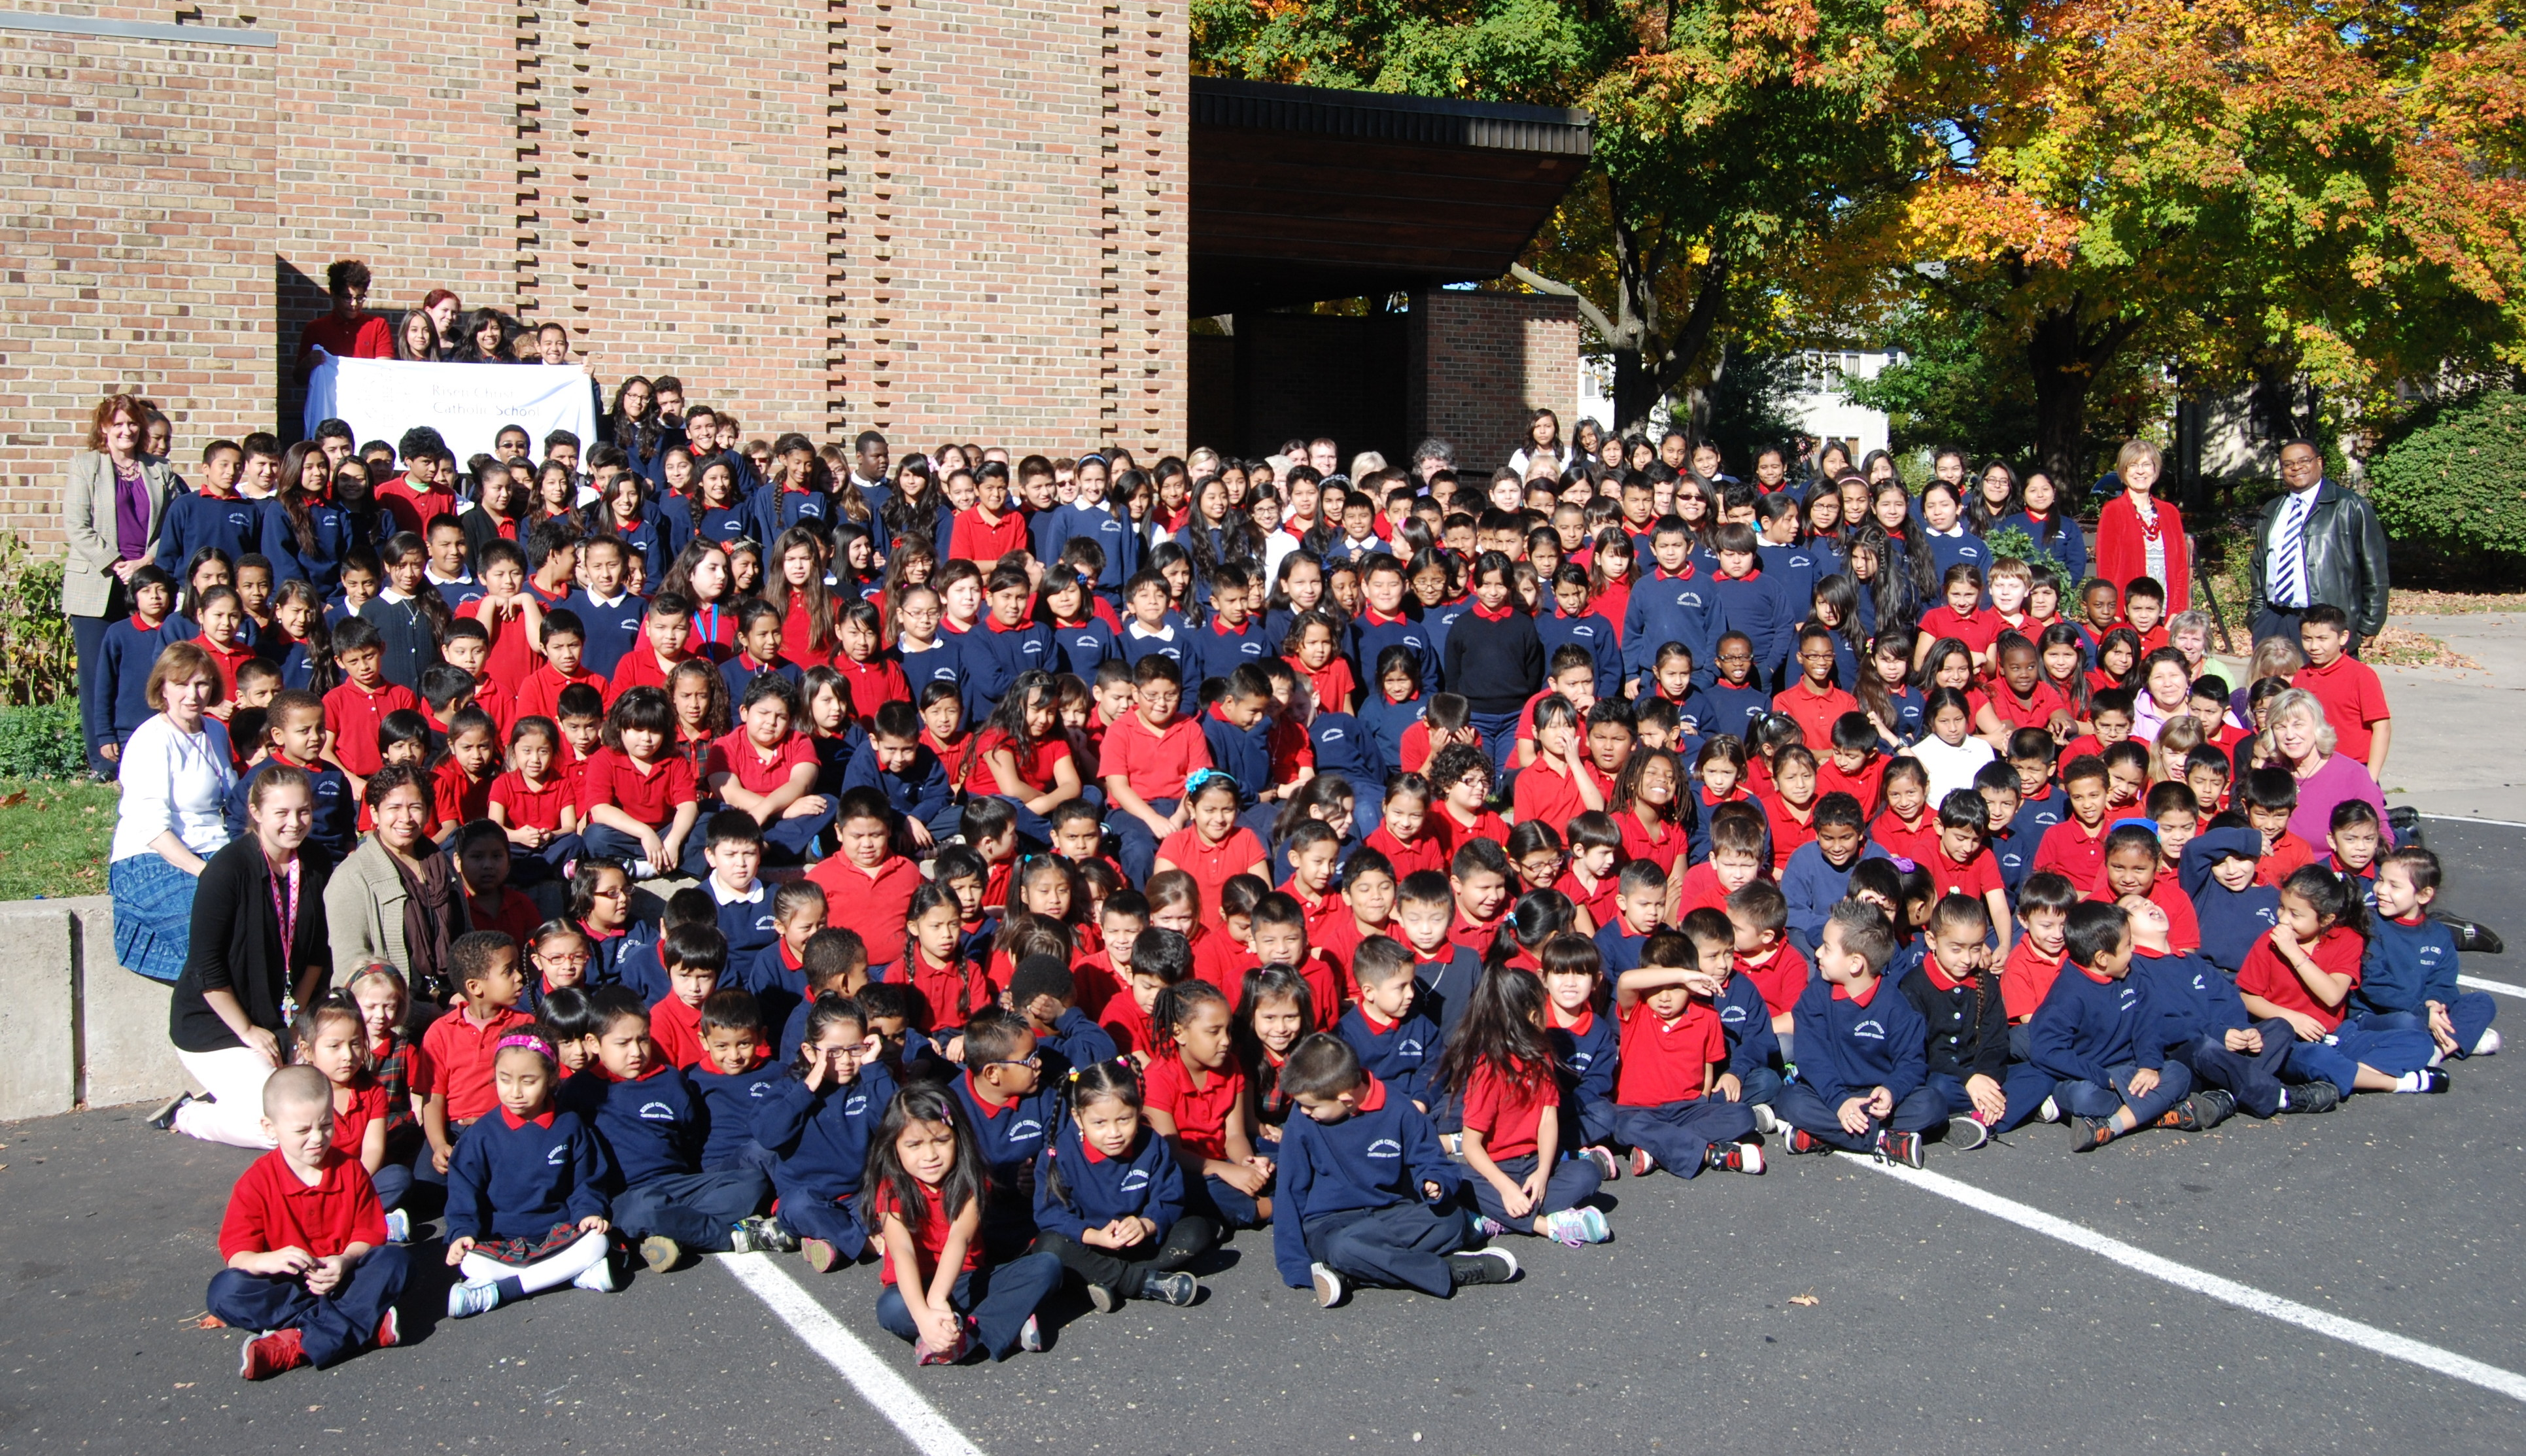 Bienvenidos a la Escuela Católica Risen Christ